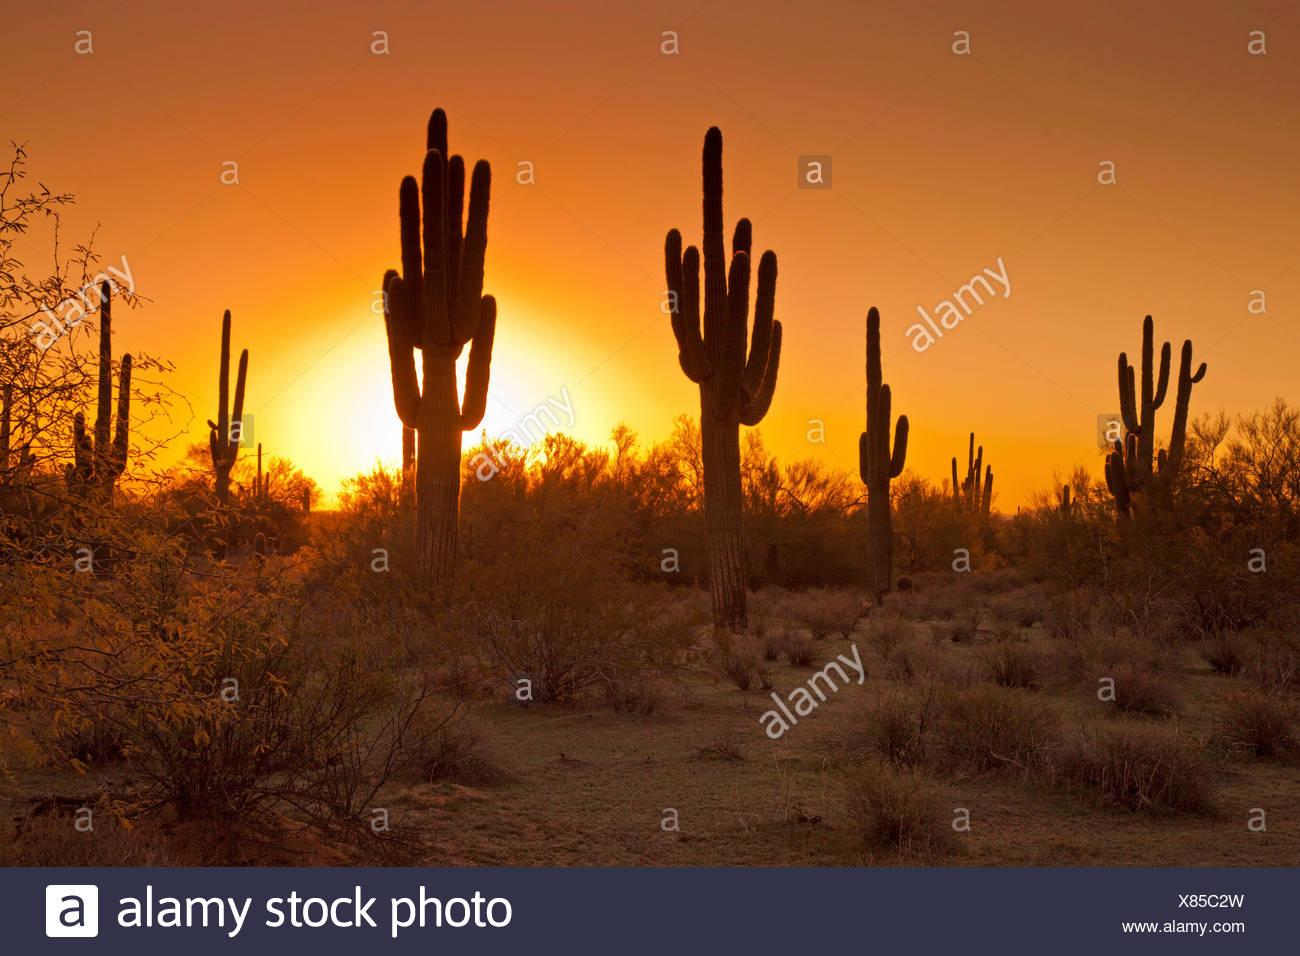 Saguaro-Kaktus (Carnegiea Gigantea, Cereus Giganteus), group bei Sonnenuntergang, USA, Arizona, Phoenix Stockfoto